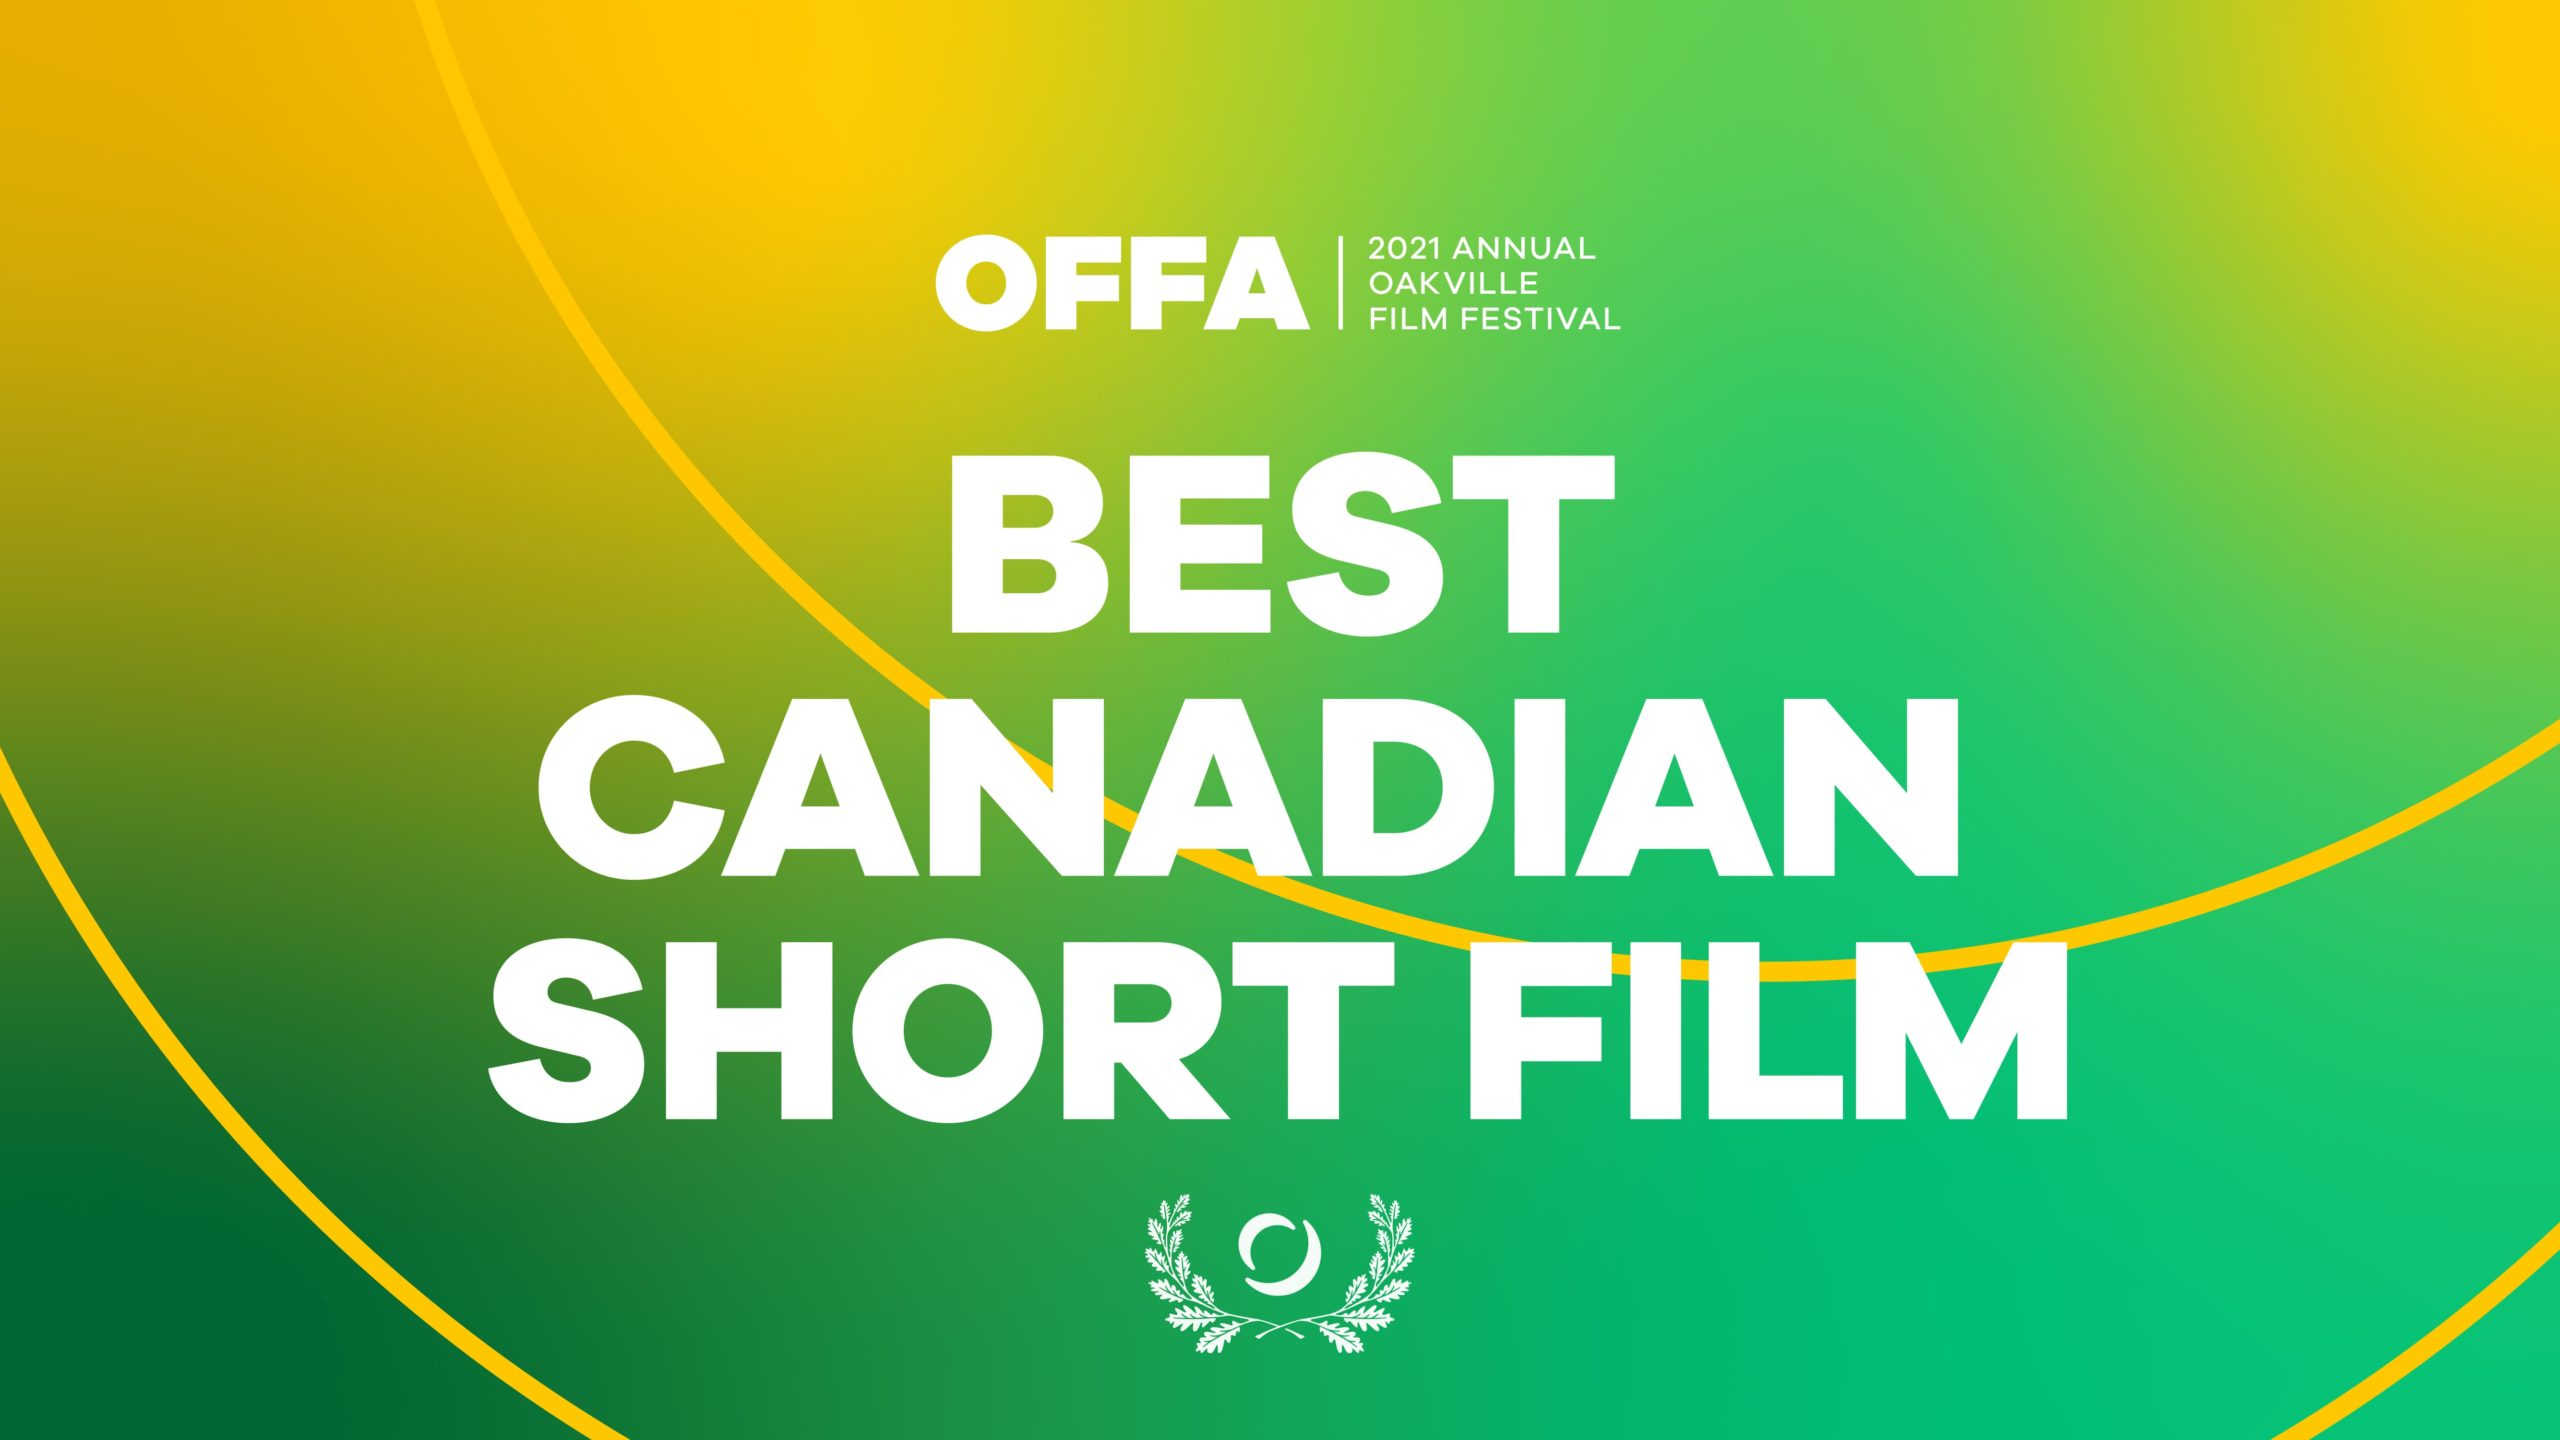 OFFA 2021 Best Canadian Short Film